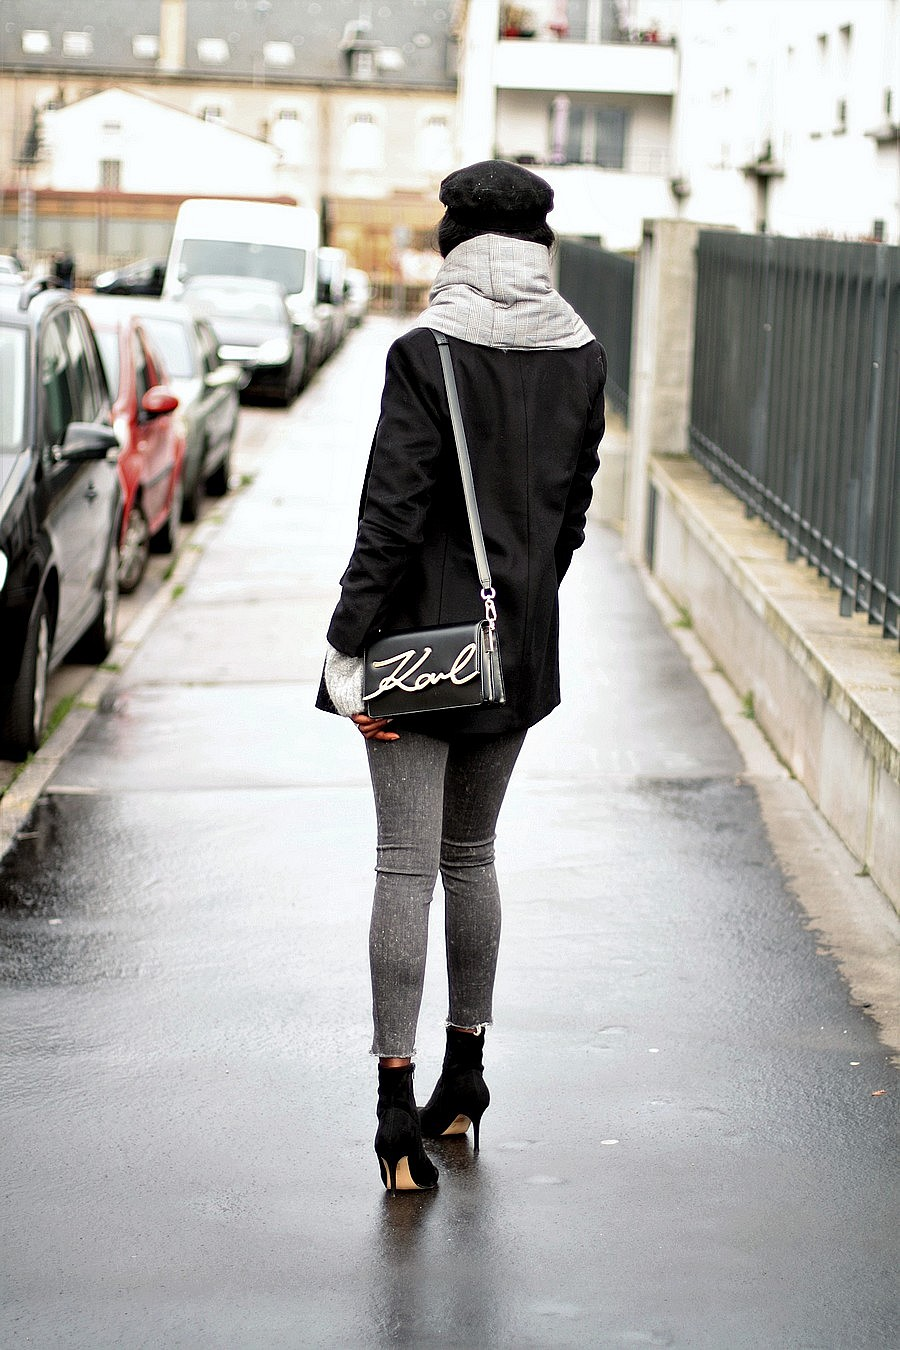 baker-boy-hat-karl-lagerfeld-bag-zara-coat-black-boots